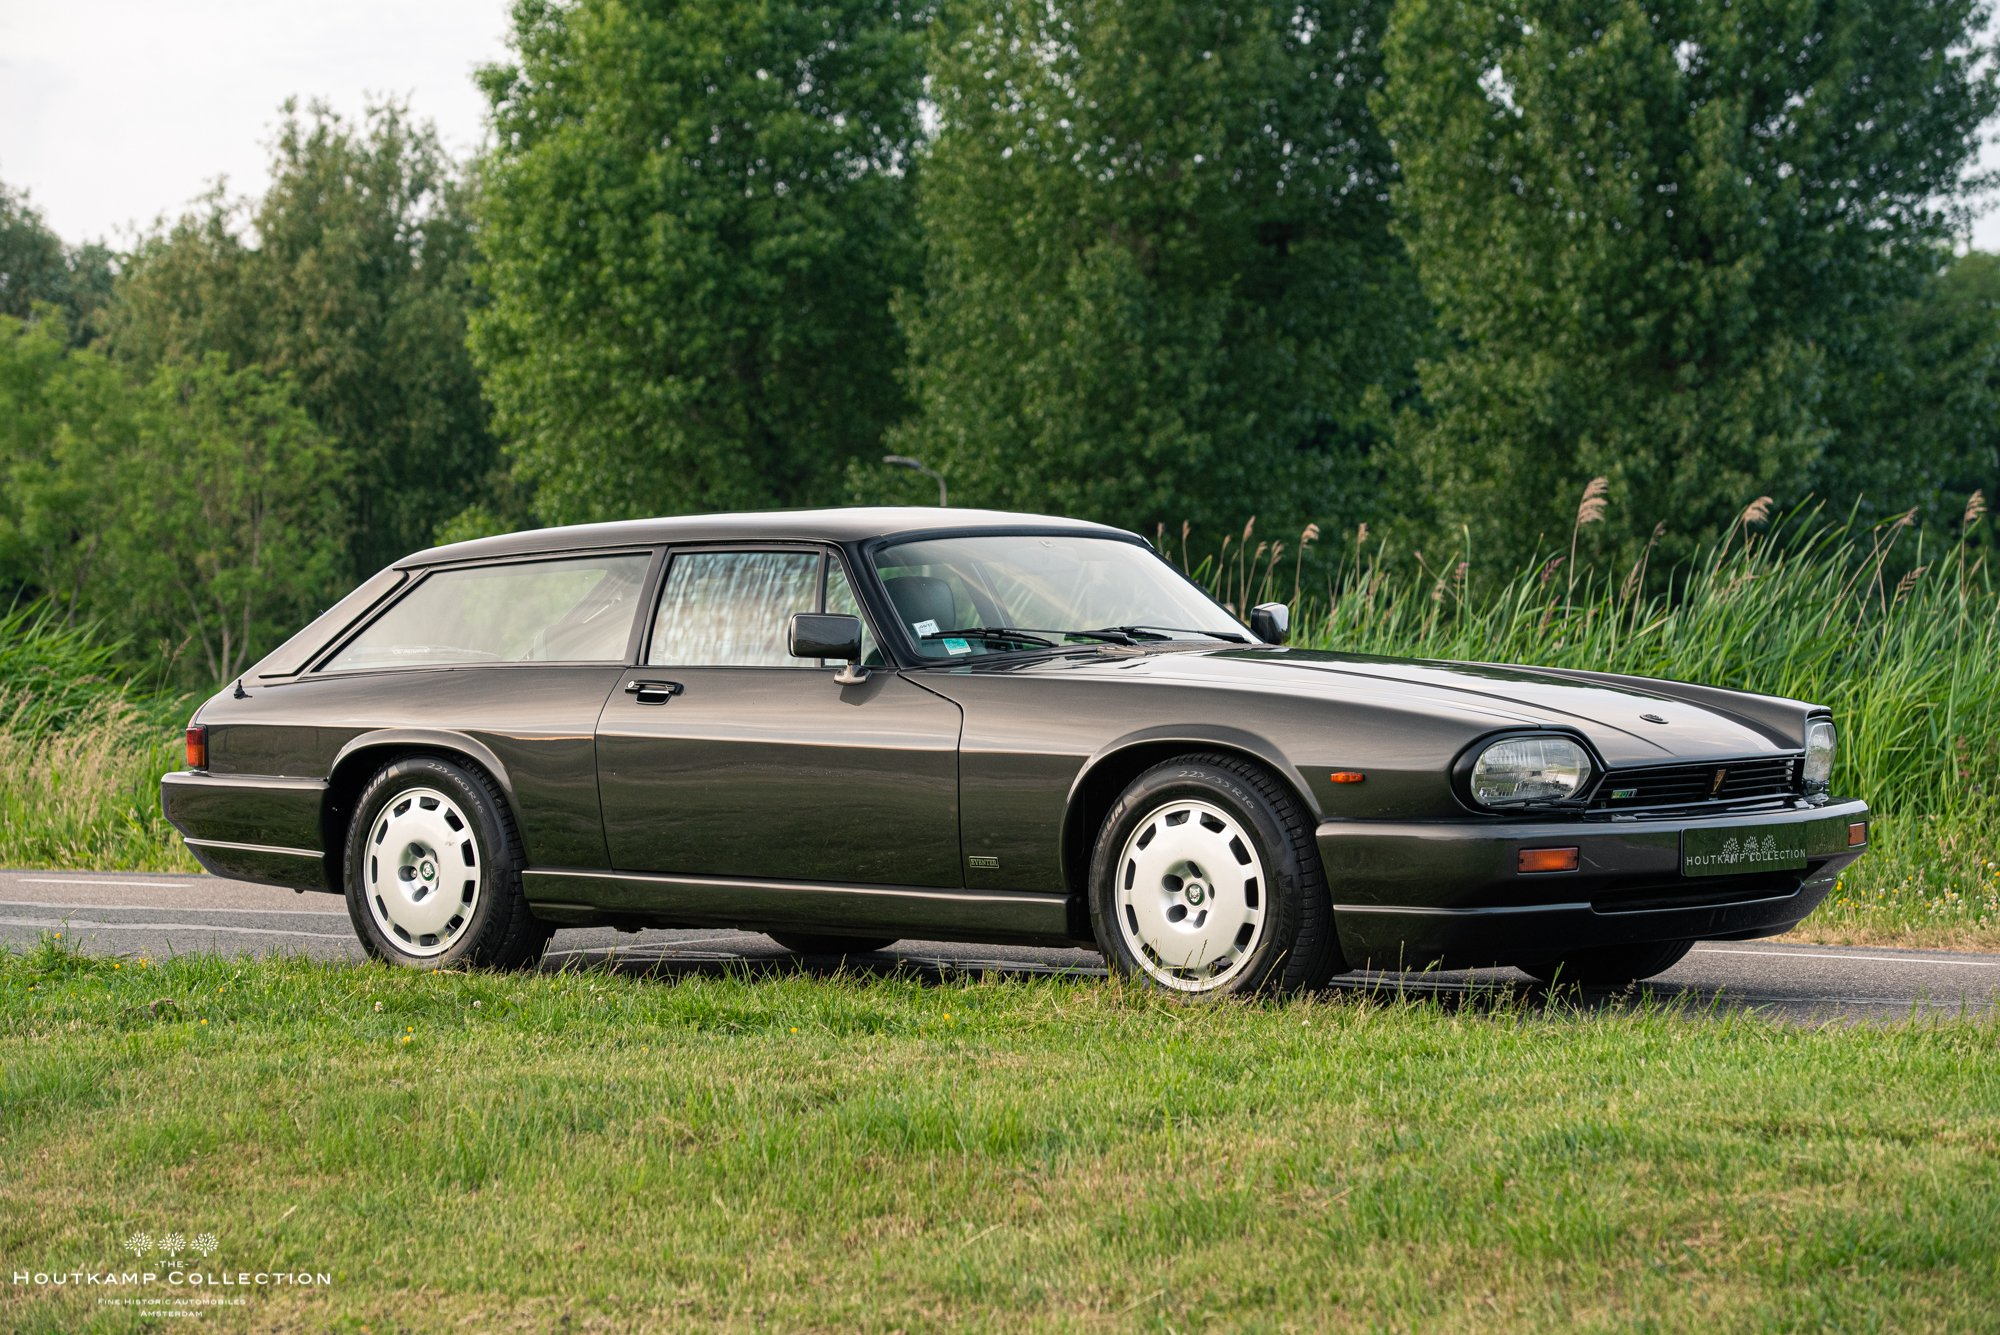 Jaguar XJR-S Lynx Eventer